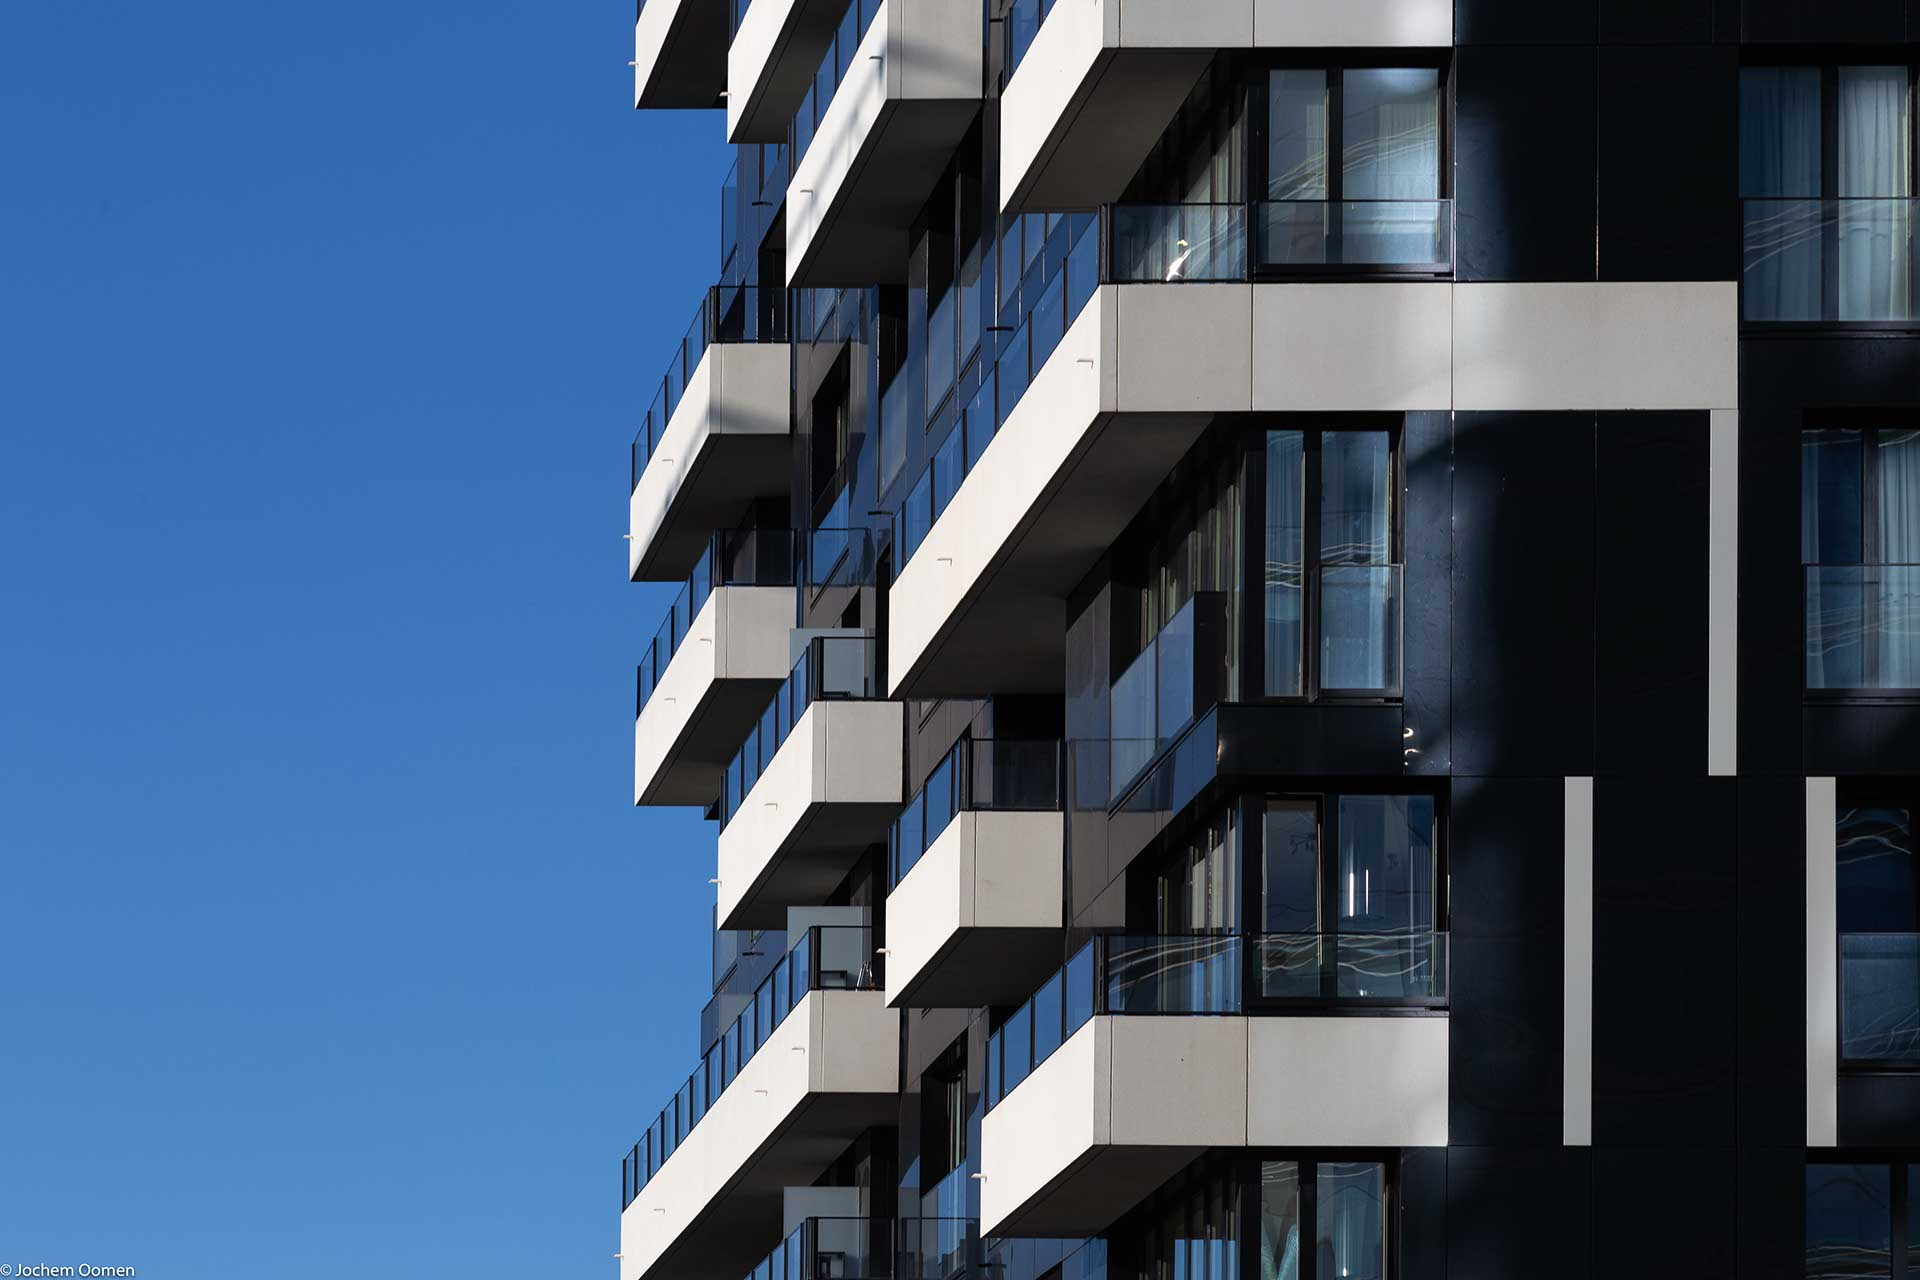 Architecture Belgium (photo: Jochem Oomen)